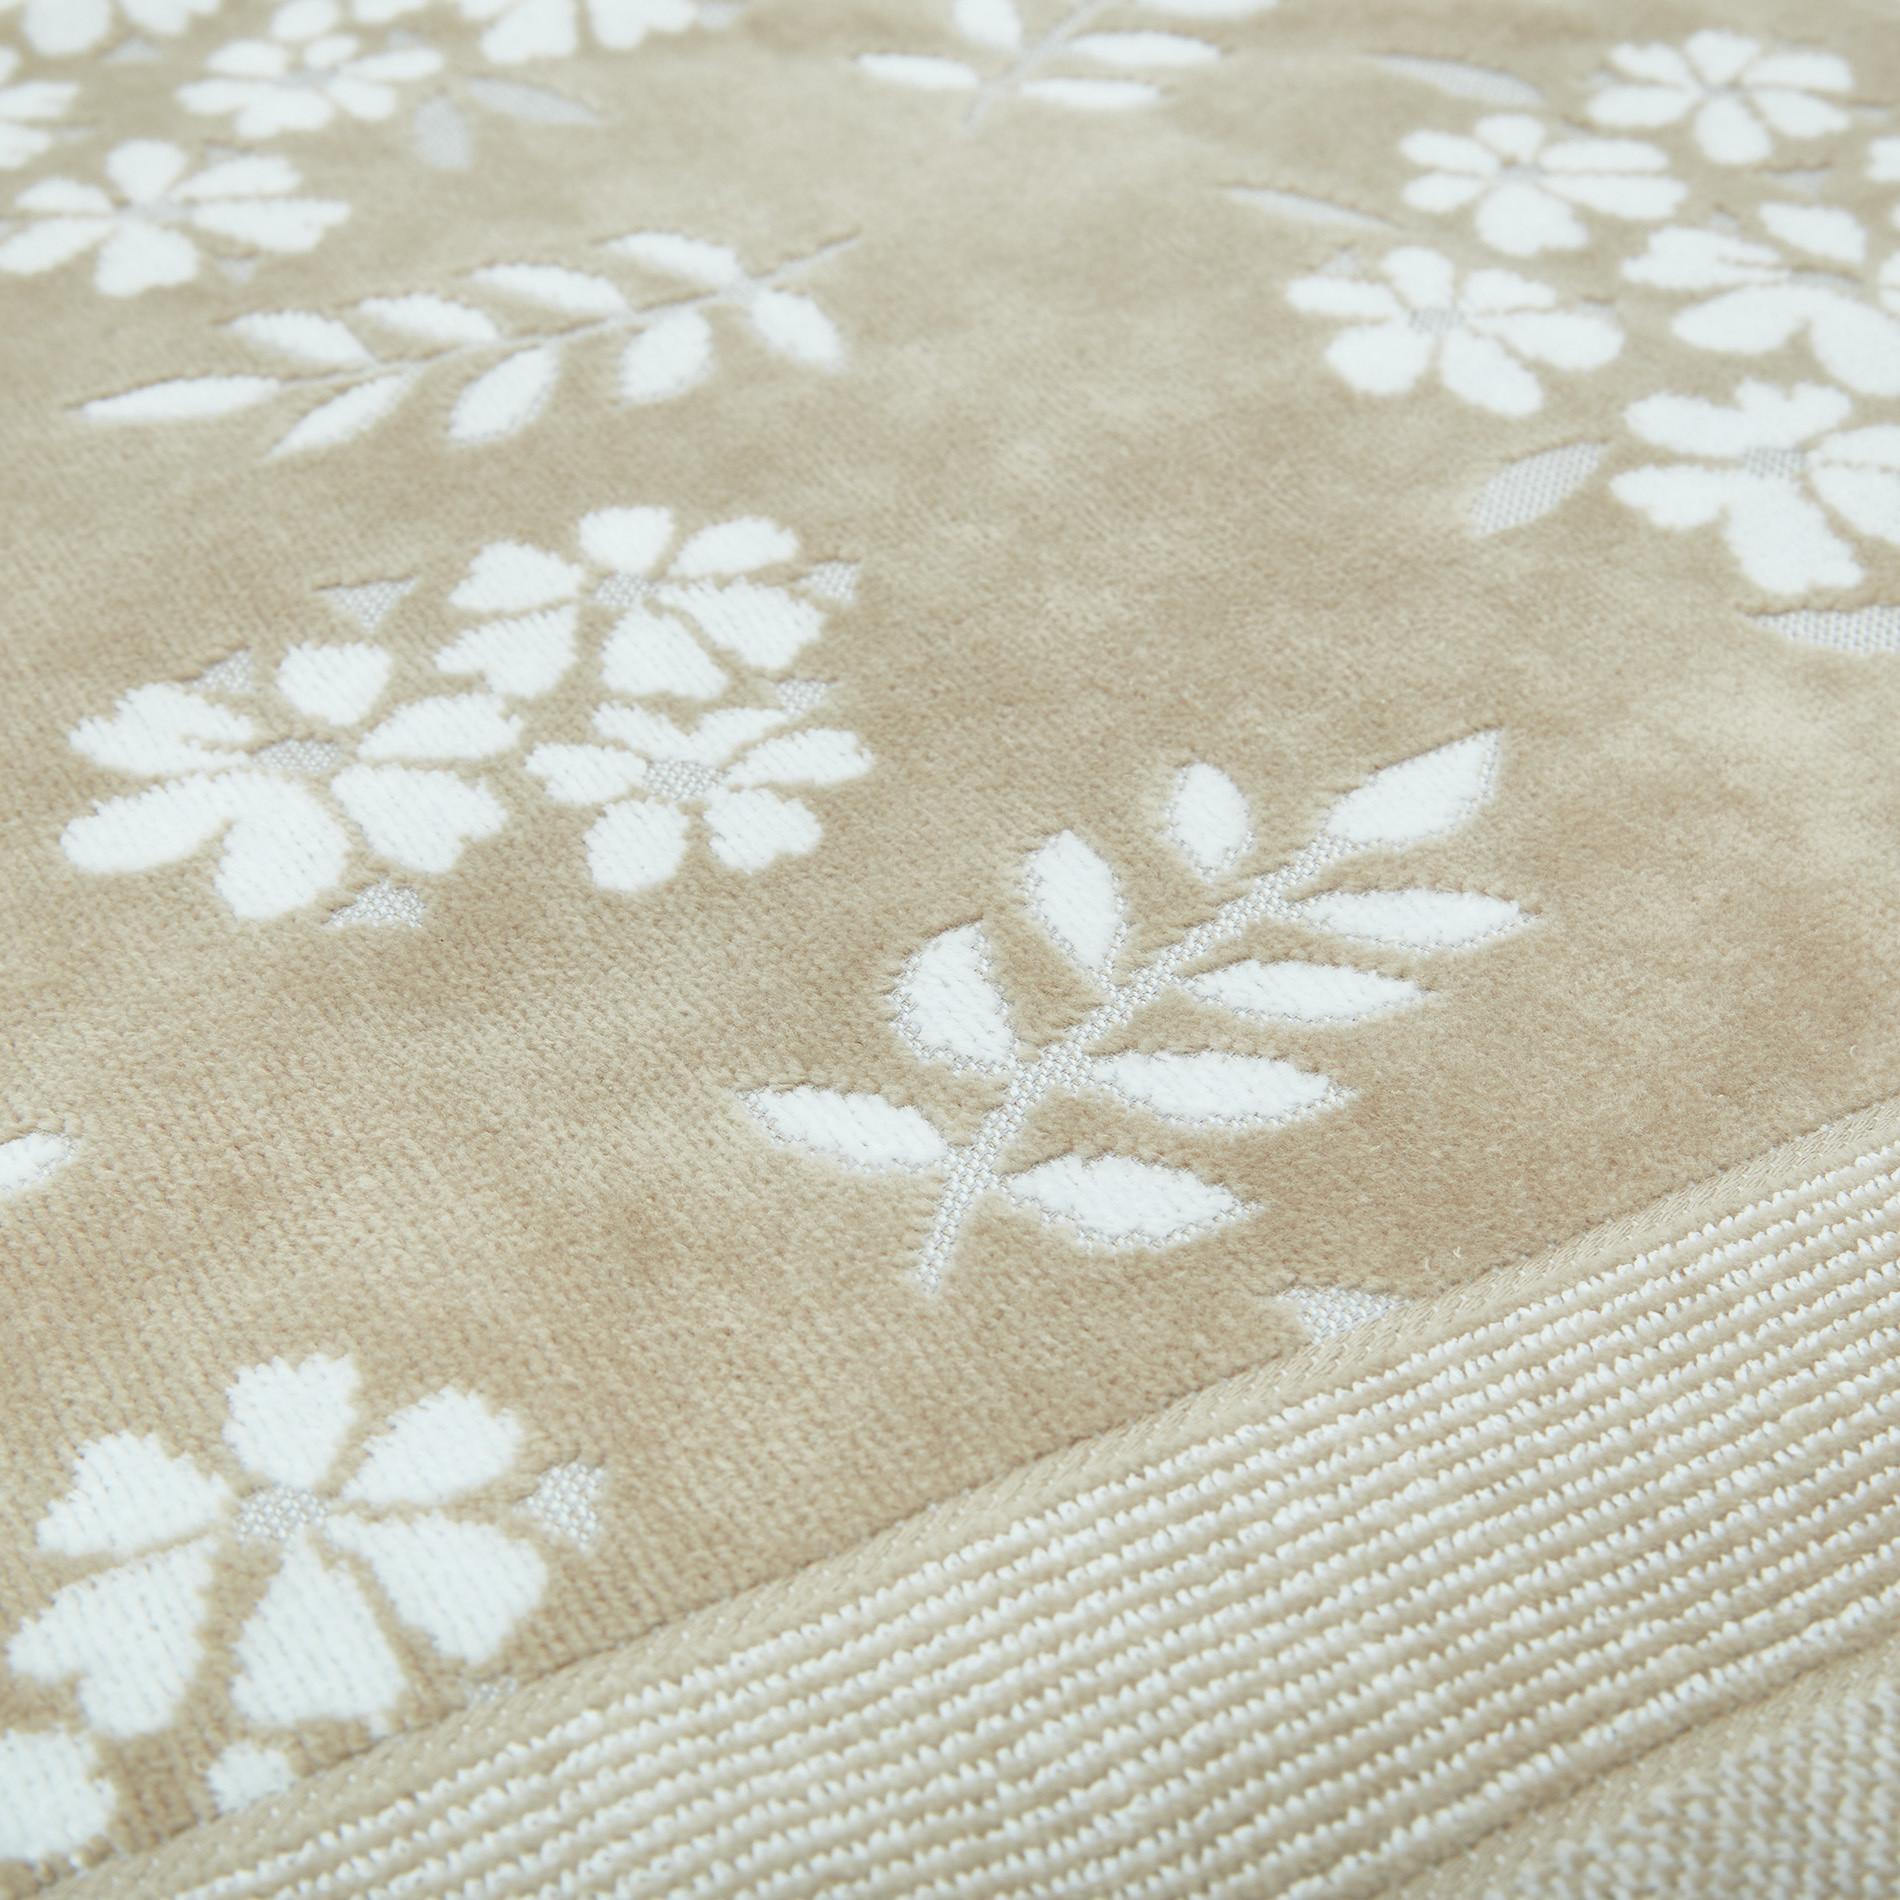 Asciugamano cotone velour motivo floreale Portofino, Beige, large image number 2